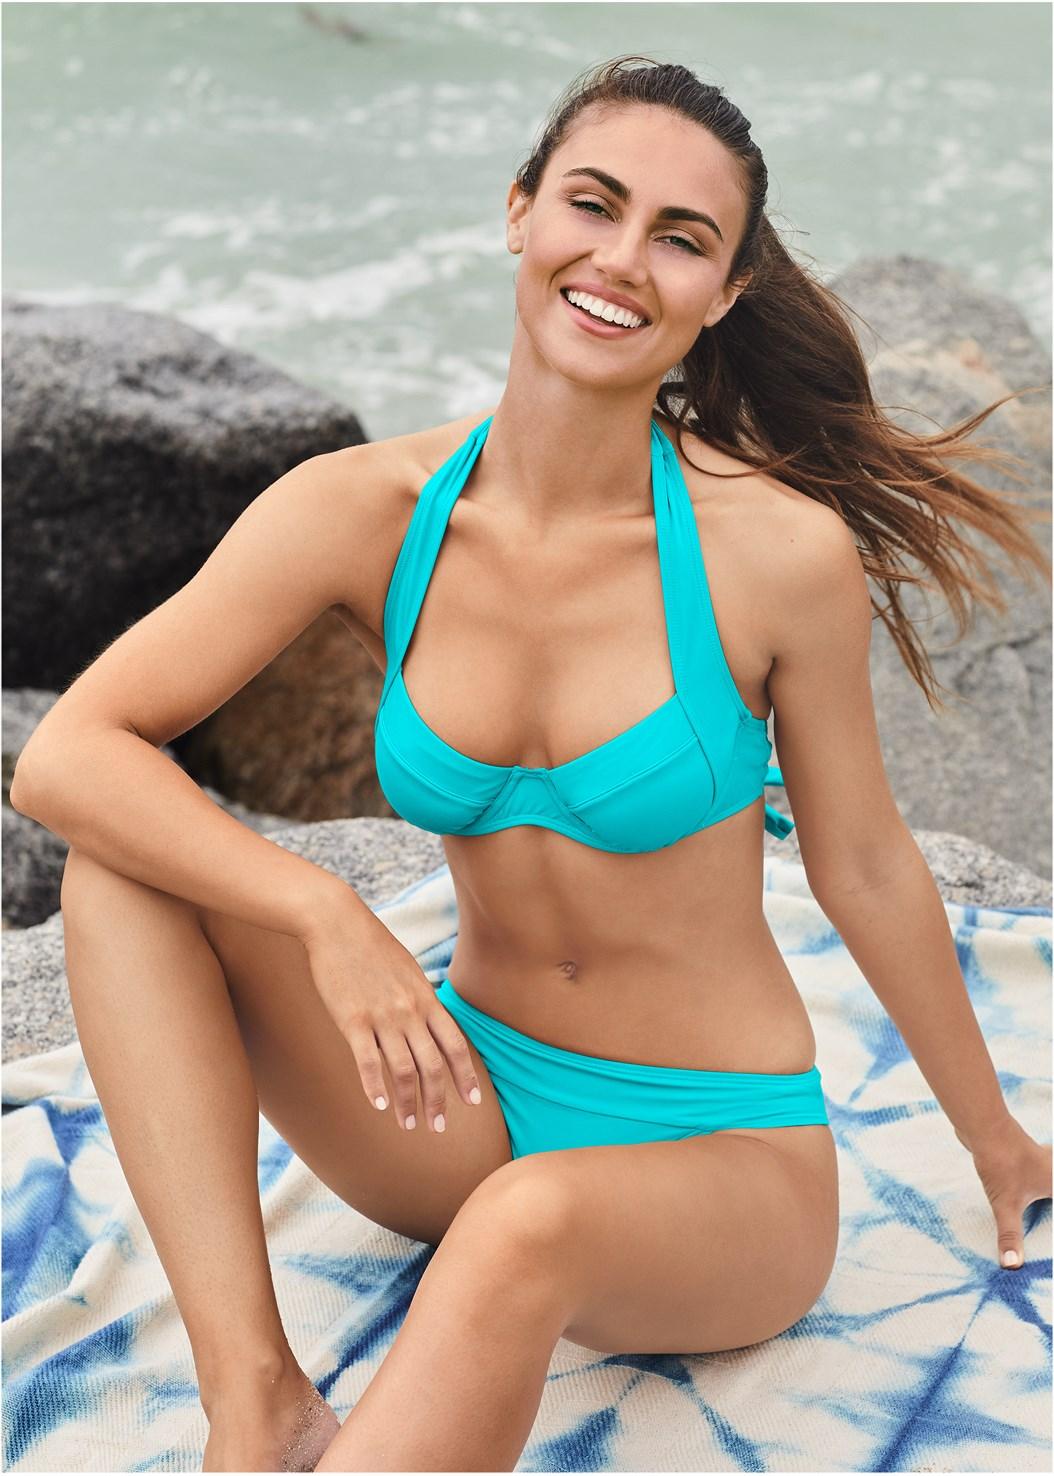 Banded Swim Bottom,Jillian Underwire Top,Enhancer Push Up Ring Halter Triangle Top ,Goddess Enhancer Push Up Halter Top